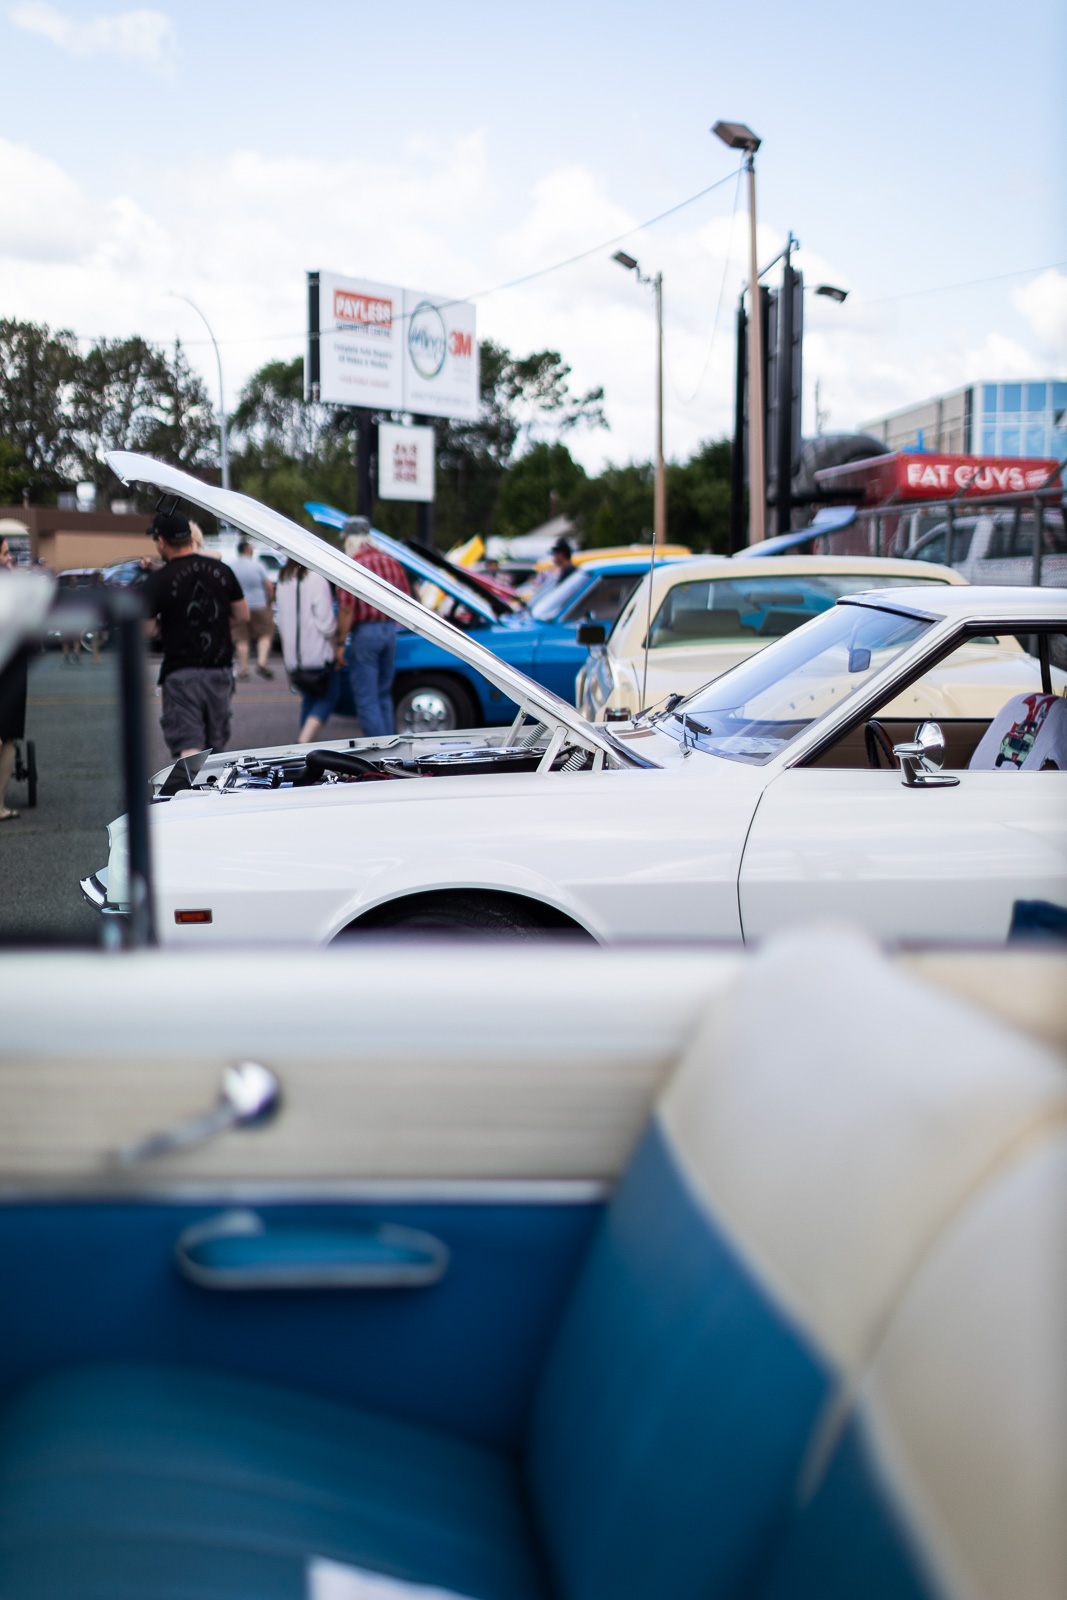 fat-guys-car-show-blog-36.jpg